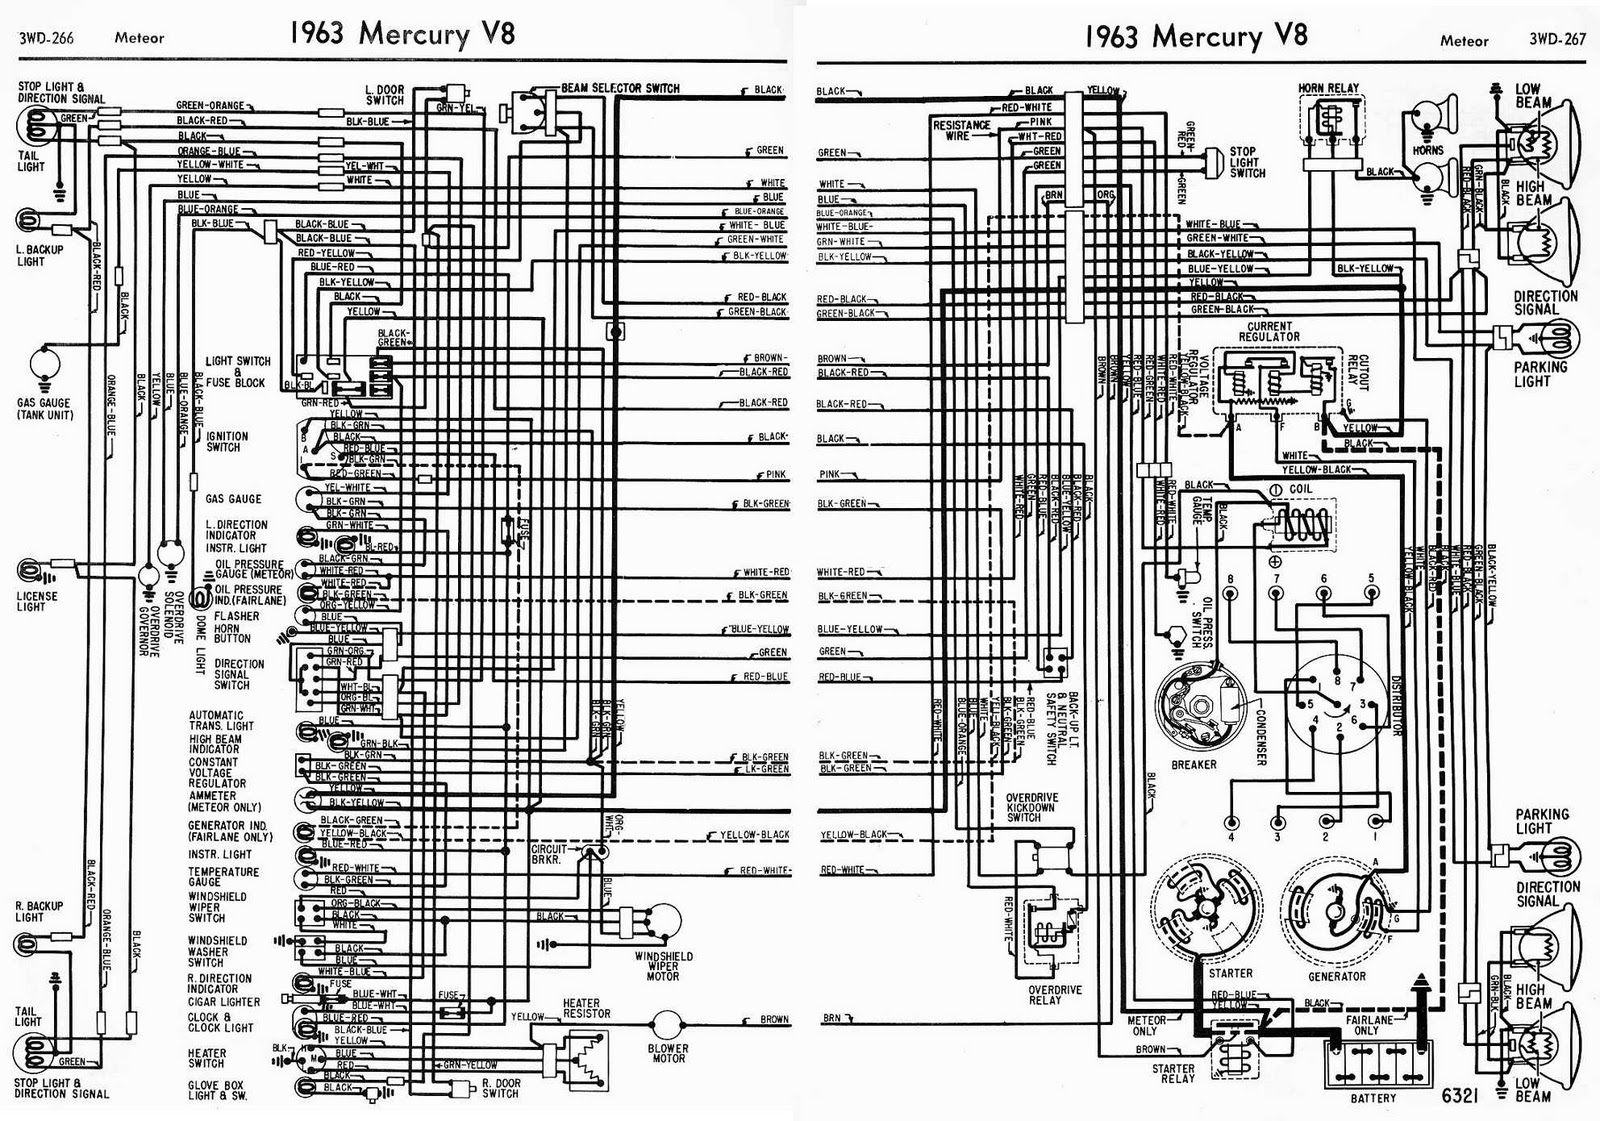 1983 honda ct110 wiring diagram: extraordinary 1972 honda cl70 wiring  diagram photos - best image